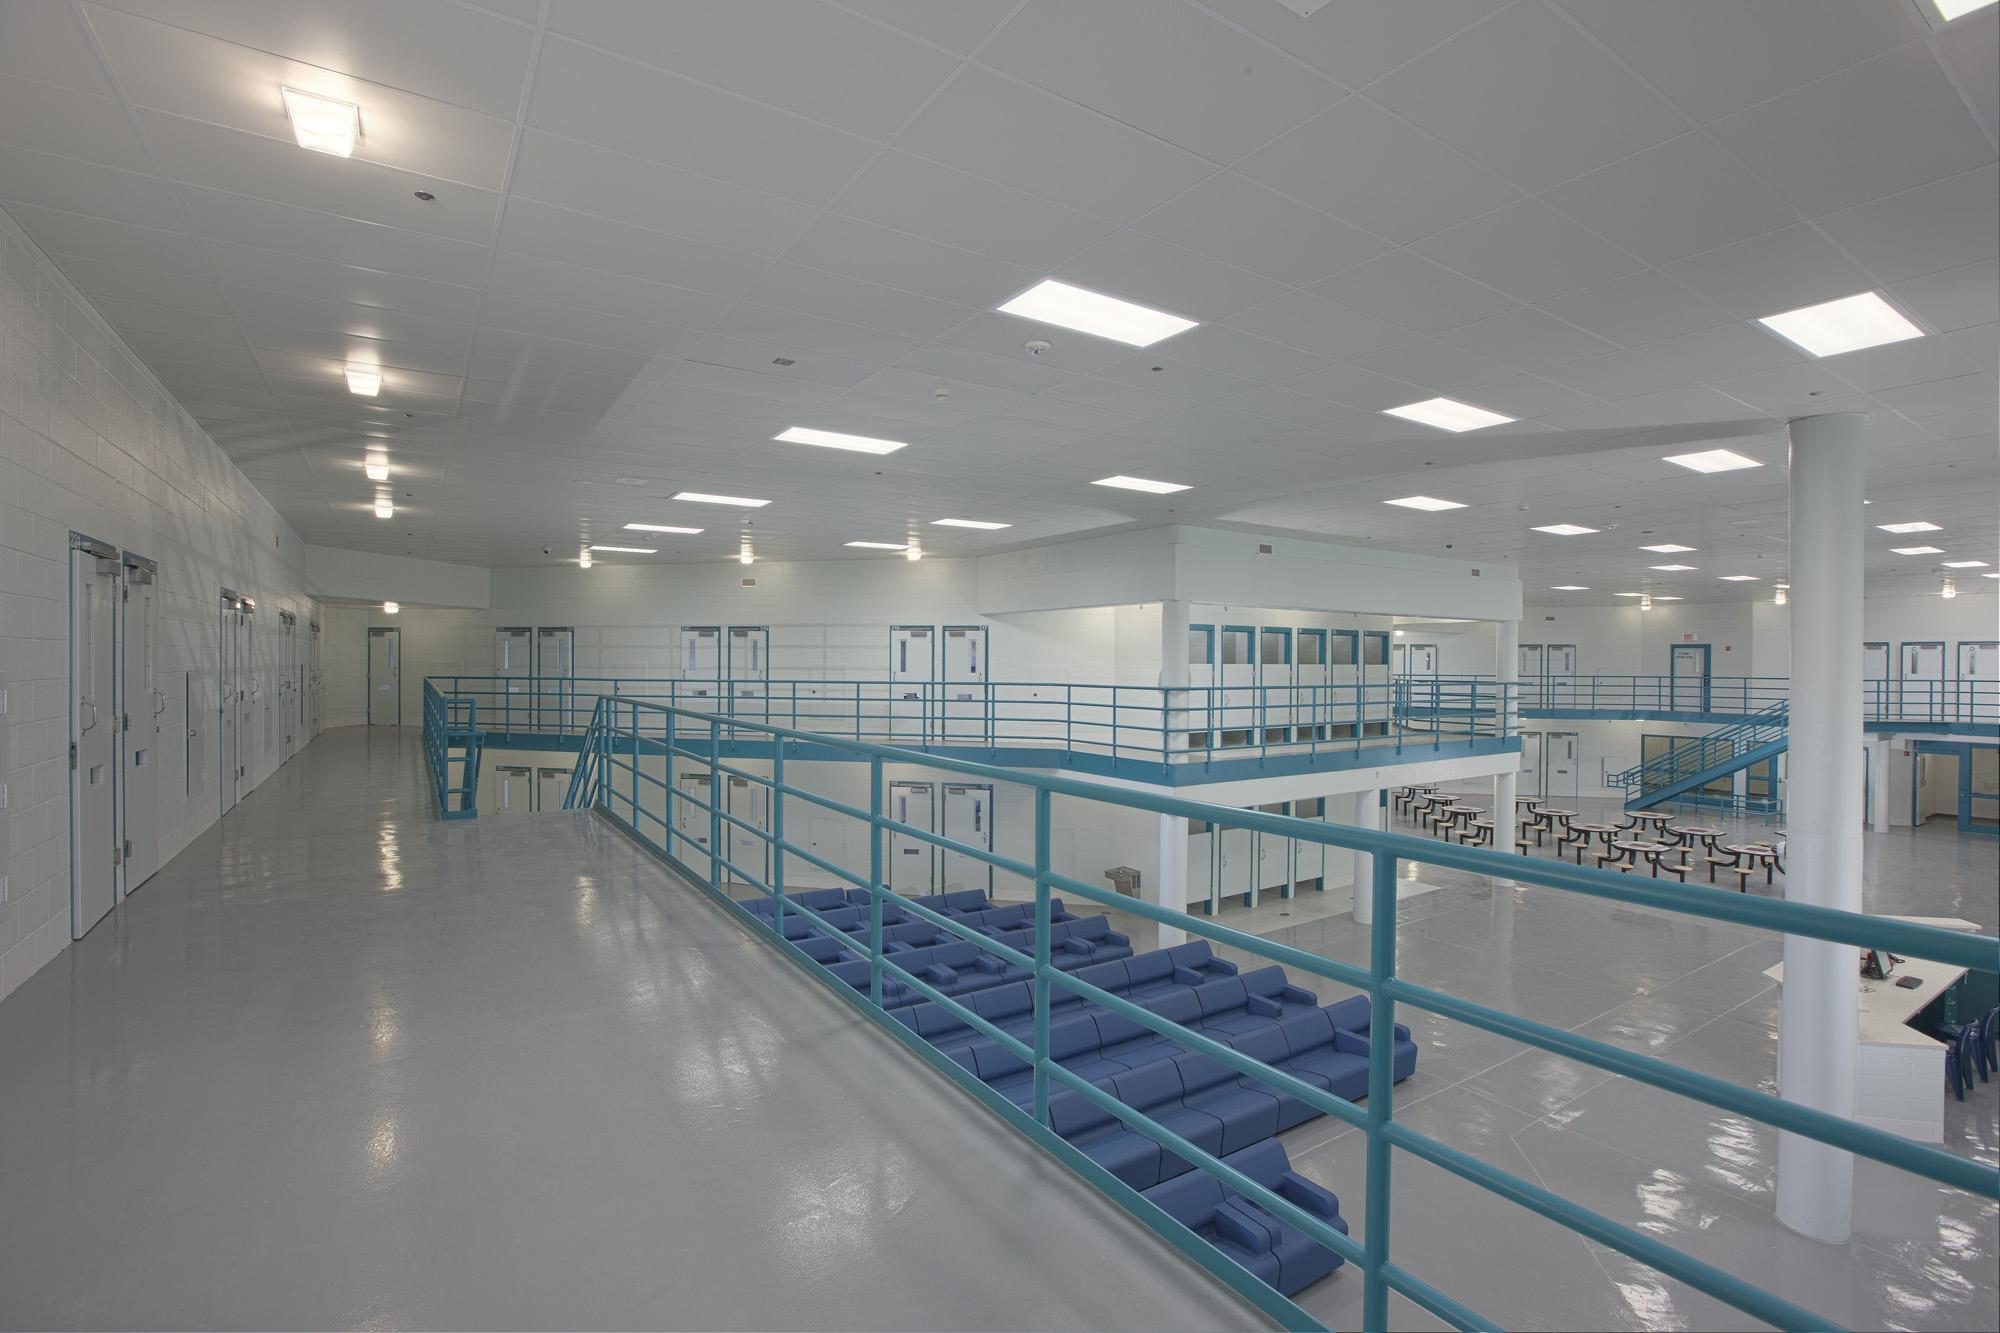 PG County Jail Interior Image R121093.jpg